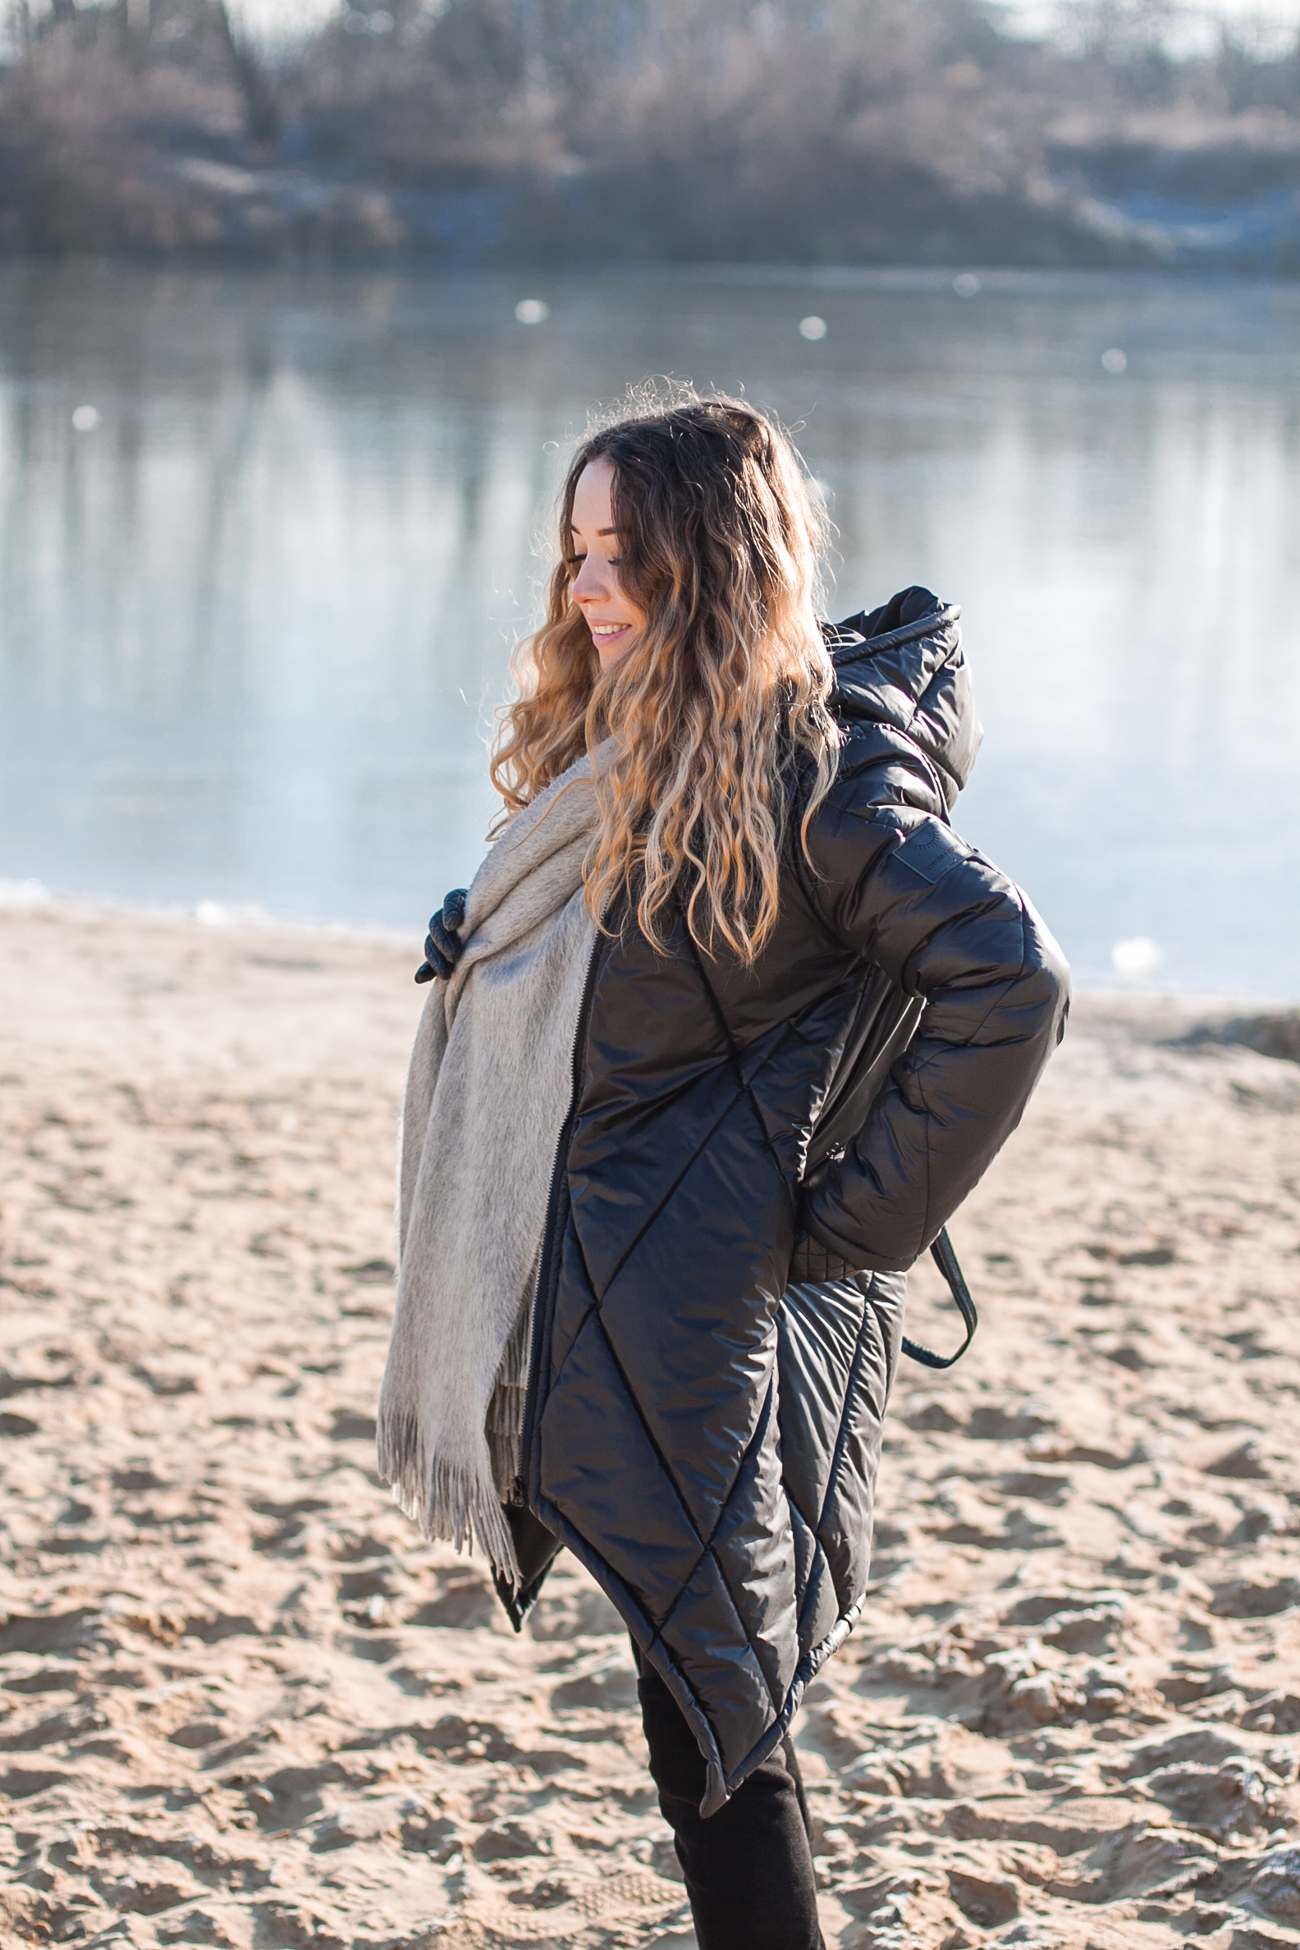 jaką kurtkę na zimę kupić